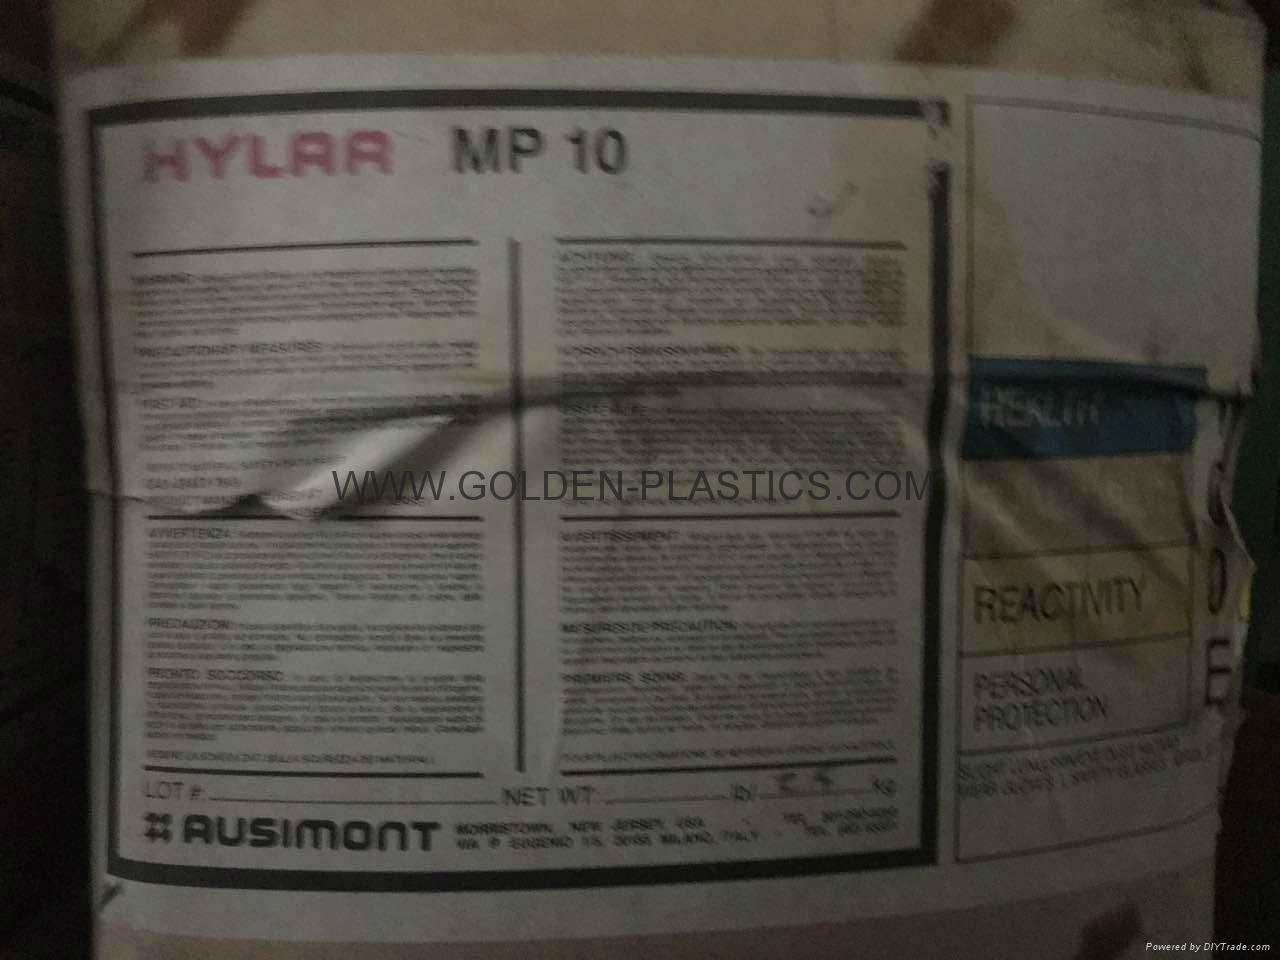 PVDF Hylar MP10